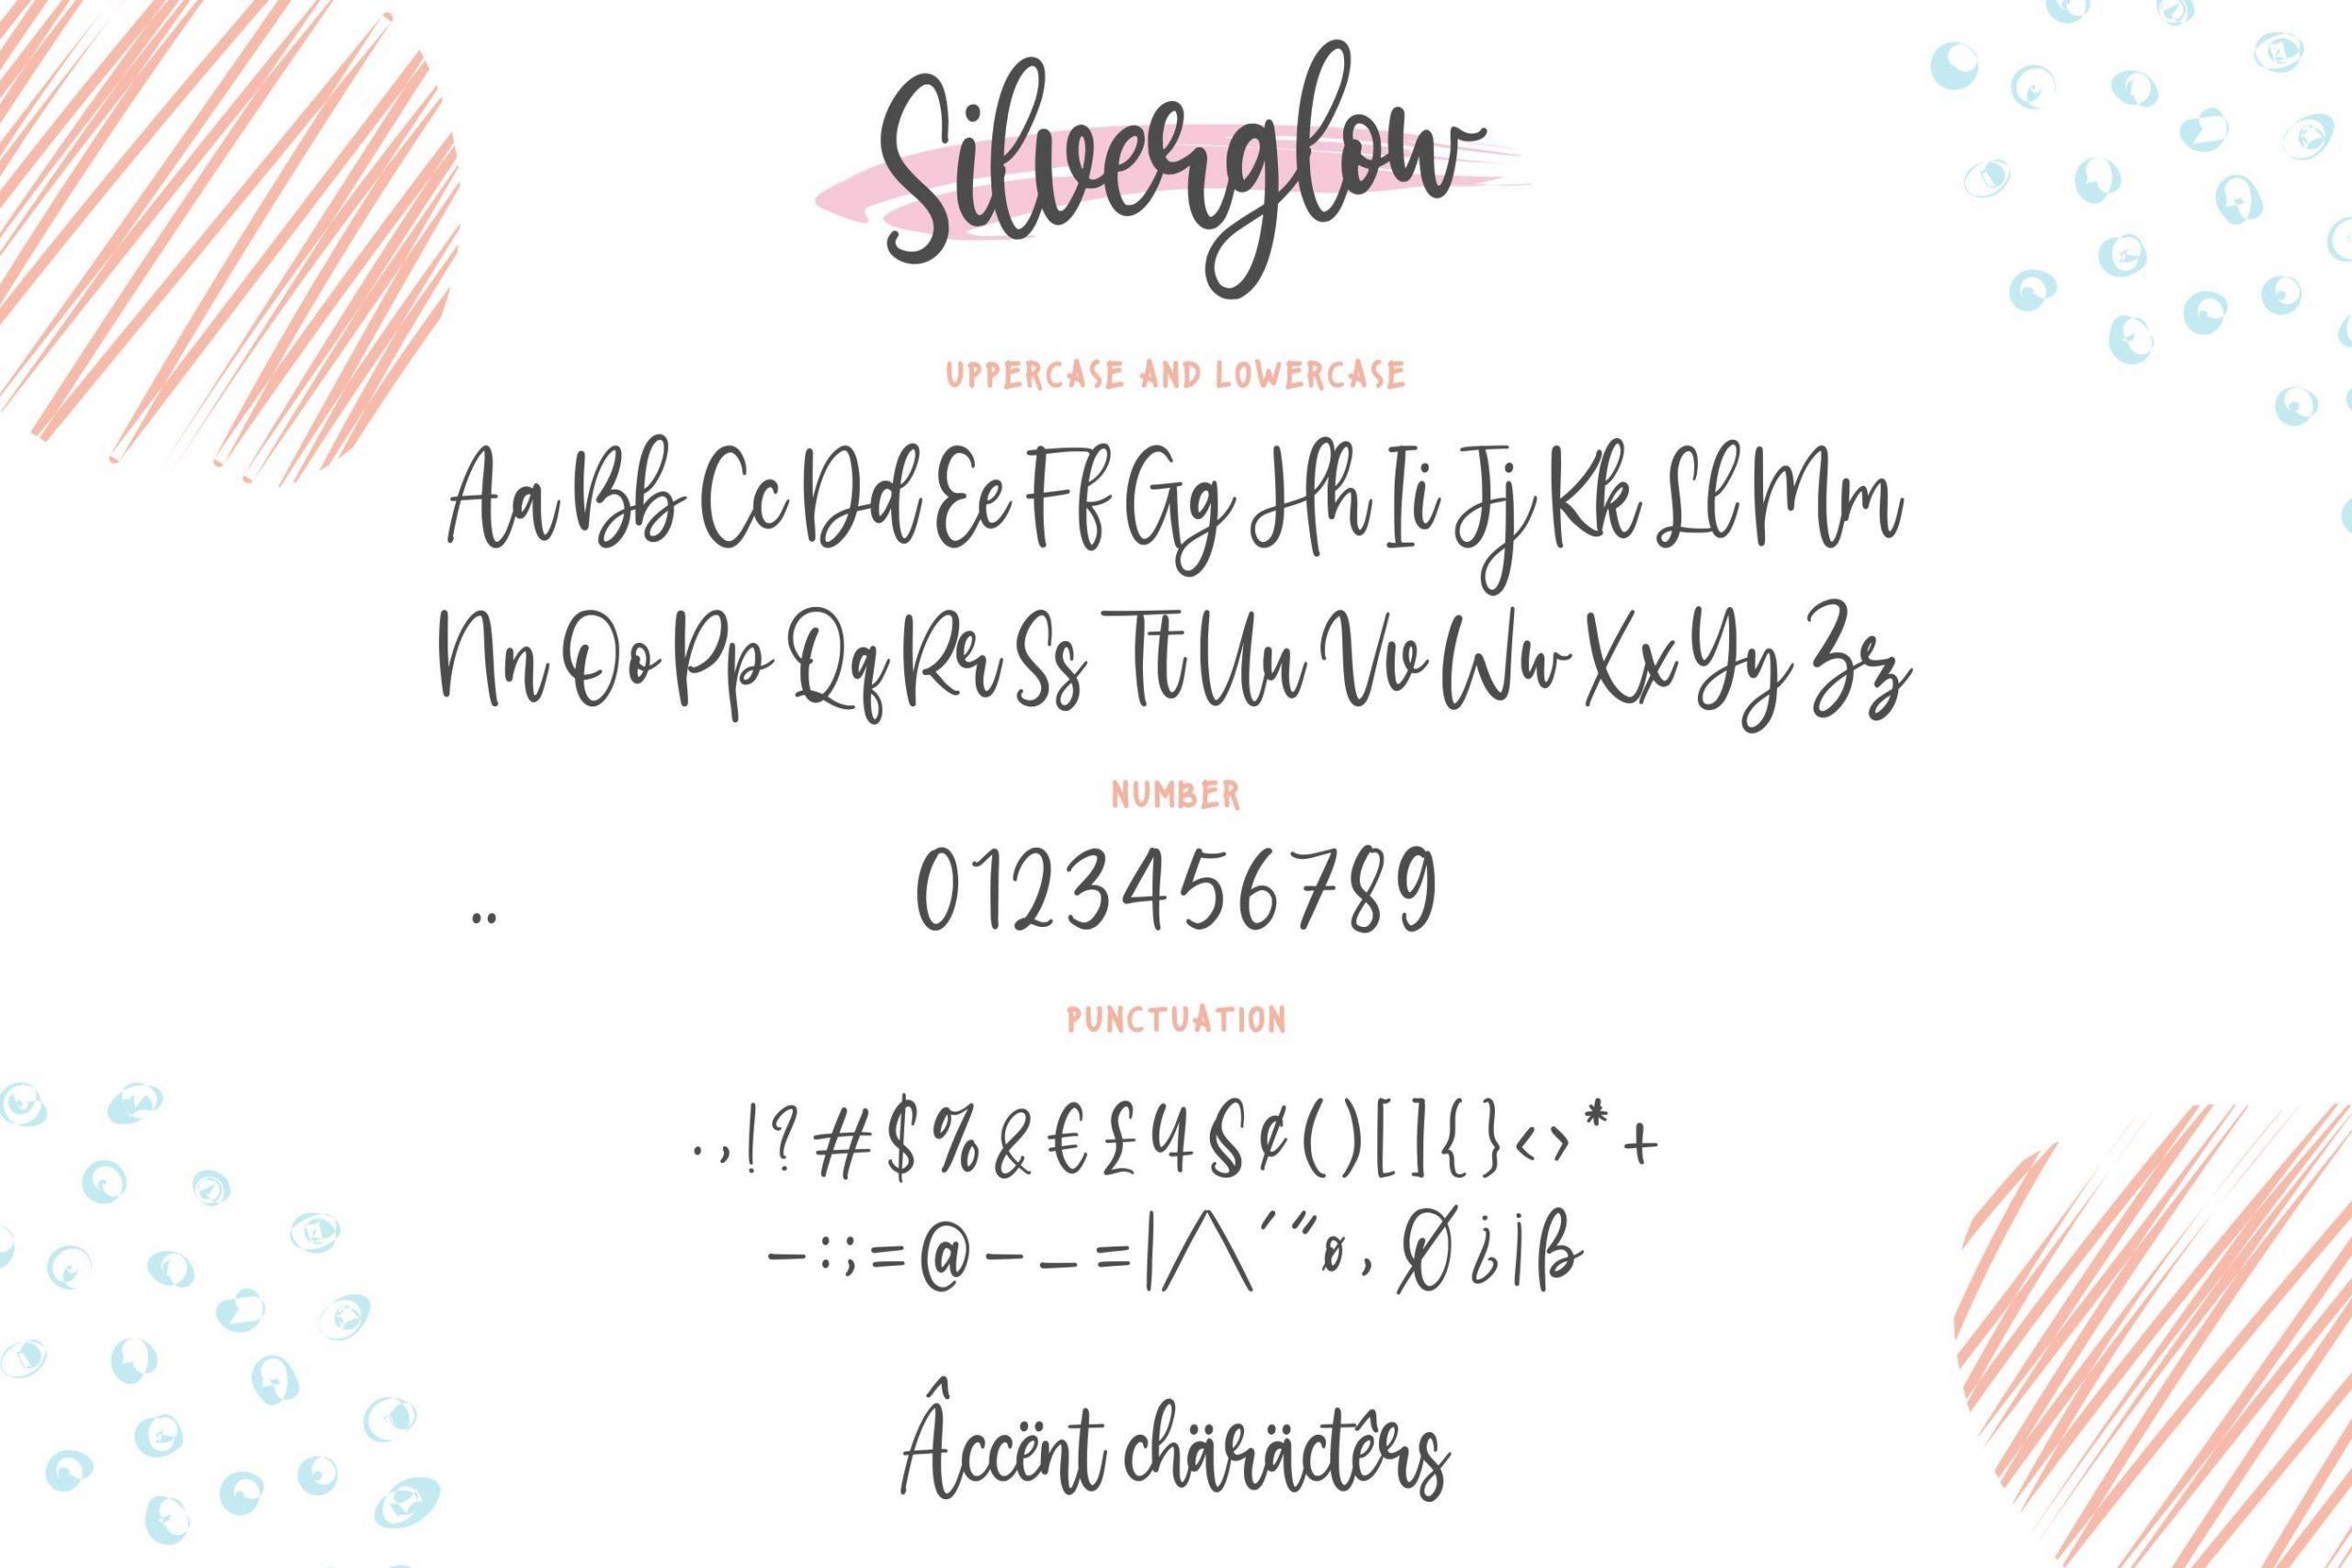 Silverglow 6